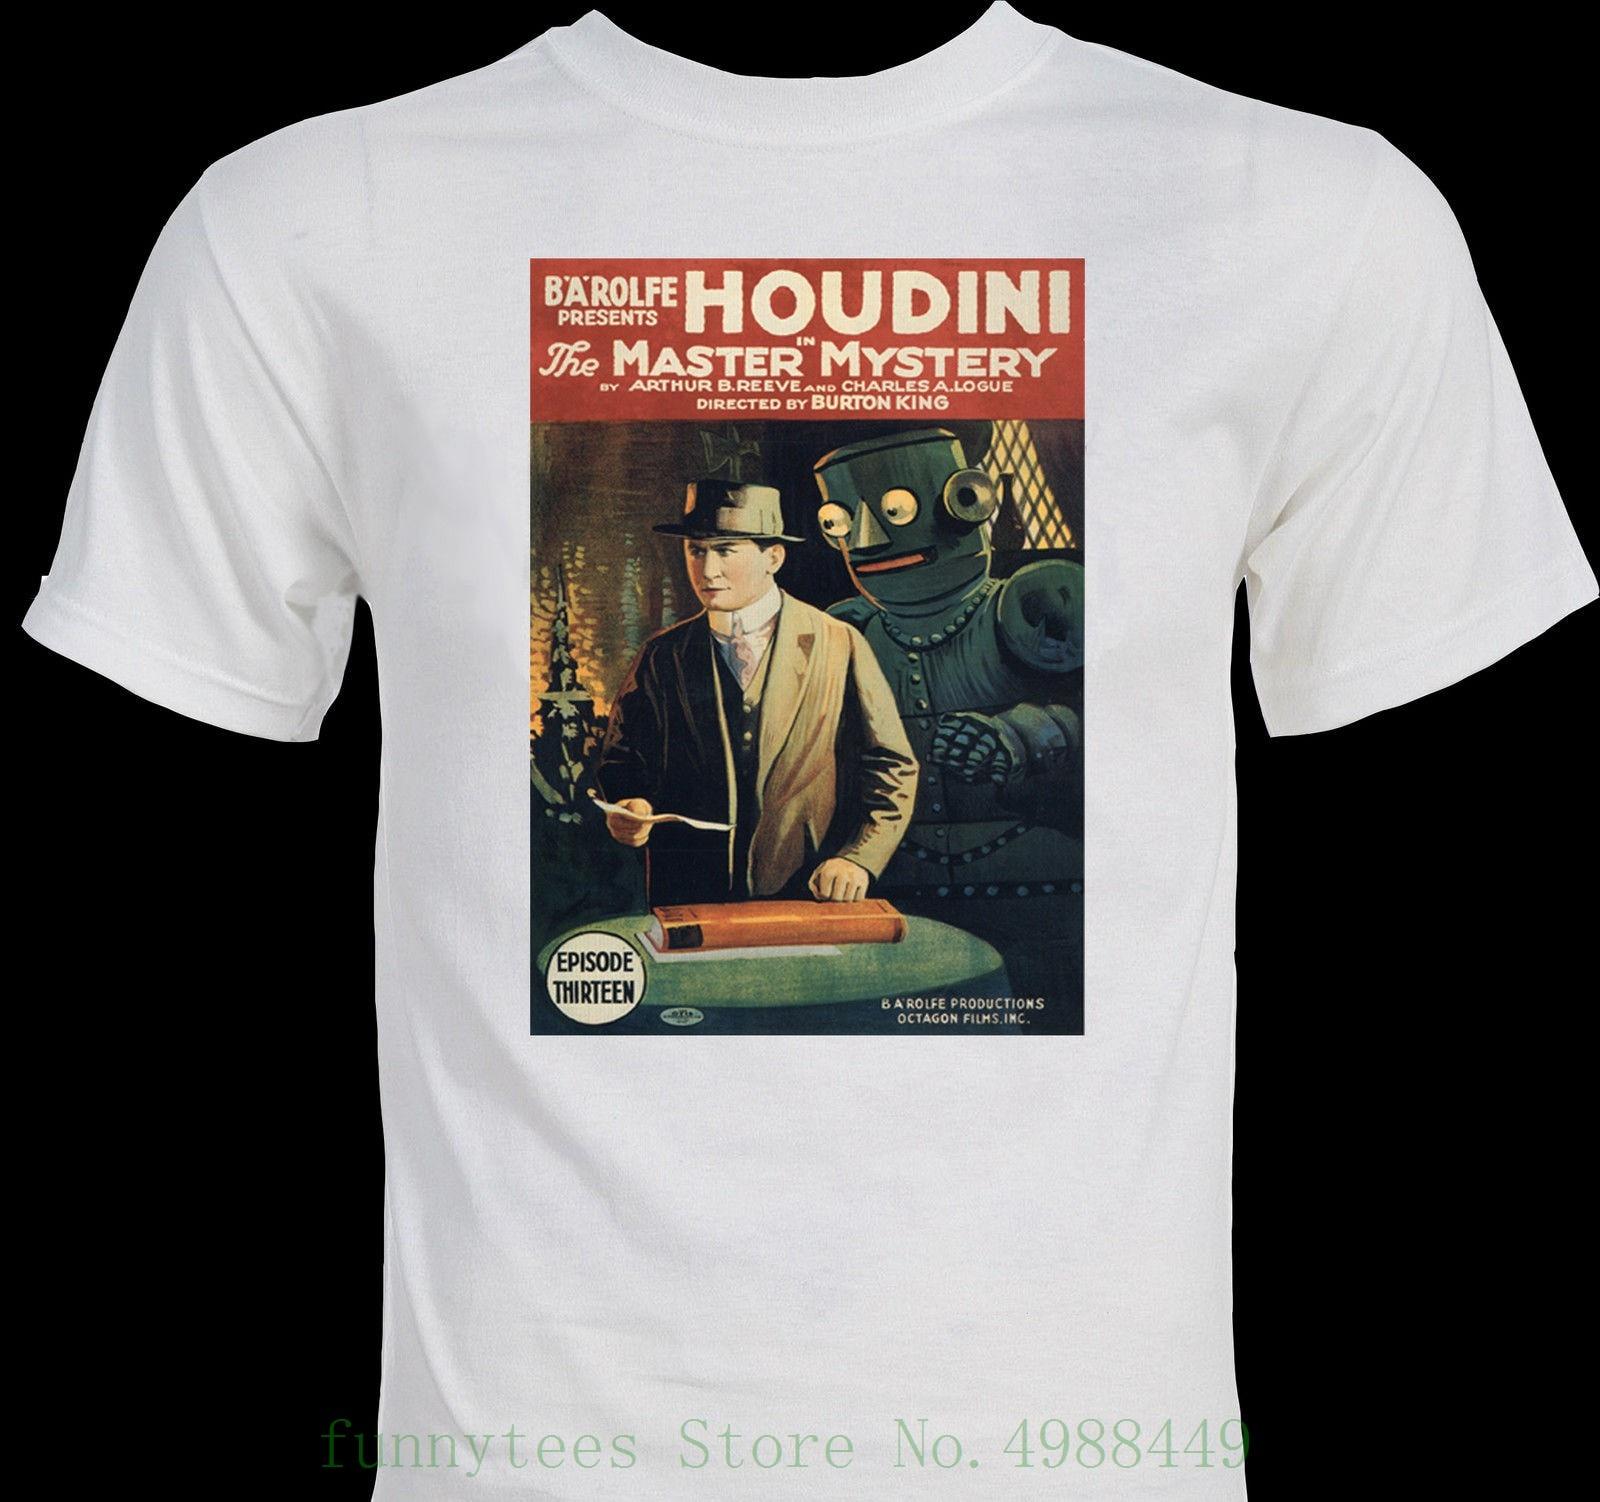 Camiseta rara Houdini 19, póster de película magia mago, camiseta de manga corta, cuello redondo, regalo Simple